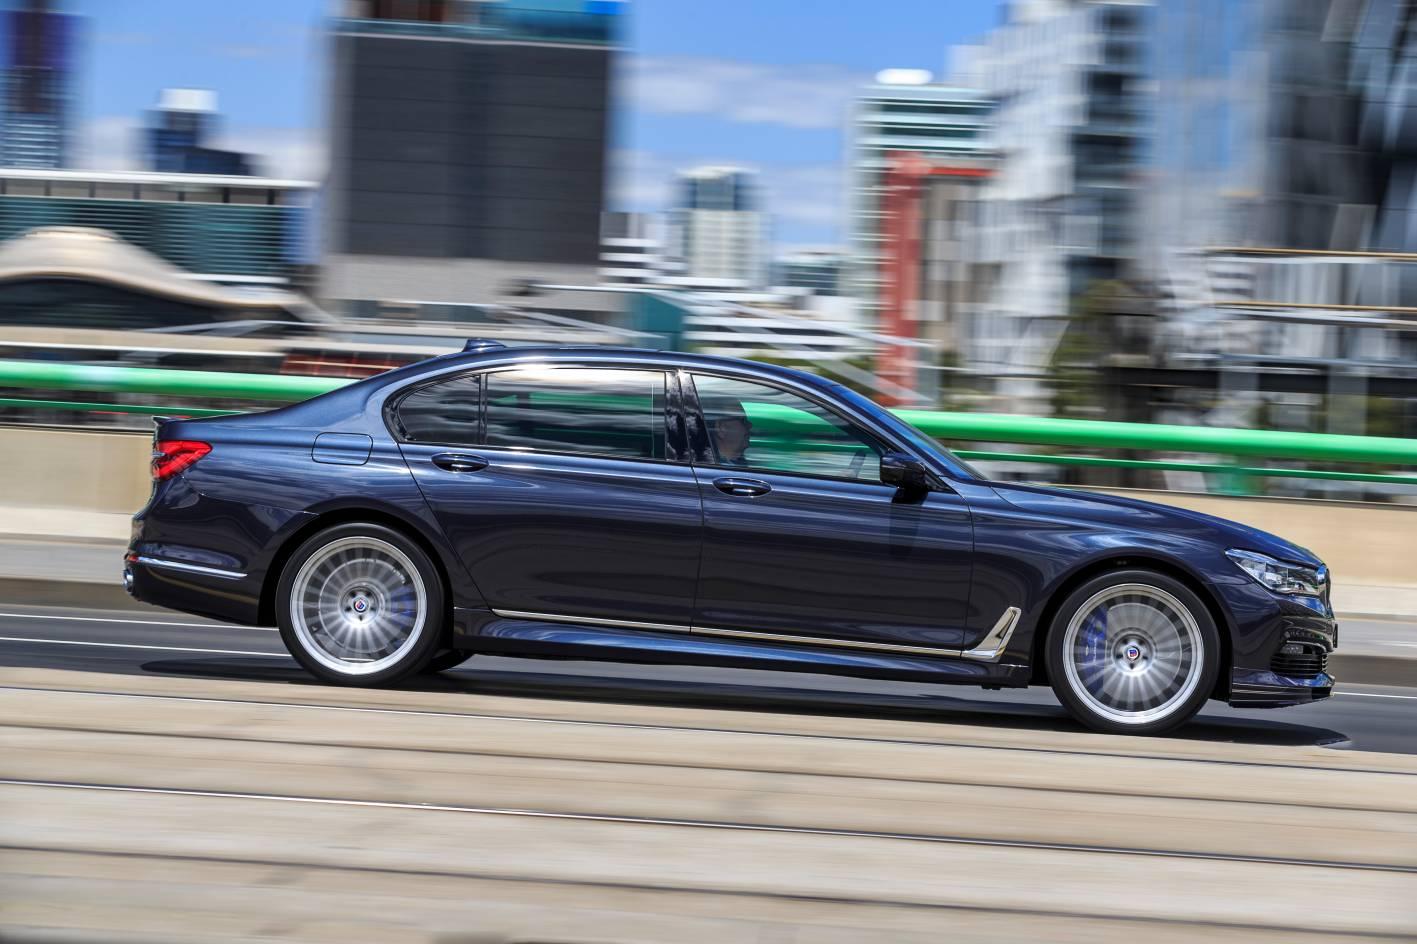 Flagship Bmw Alpina B7 Bi Turbo Lands Stuffed With 447kw 800nm Forcegt Com